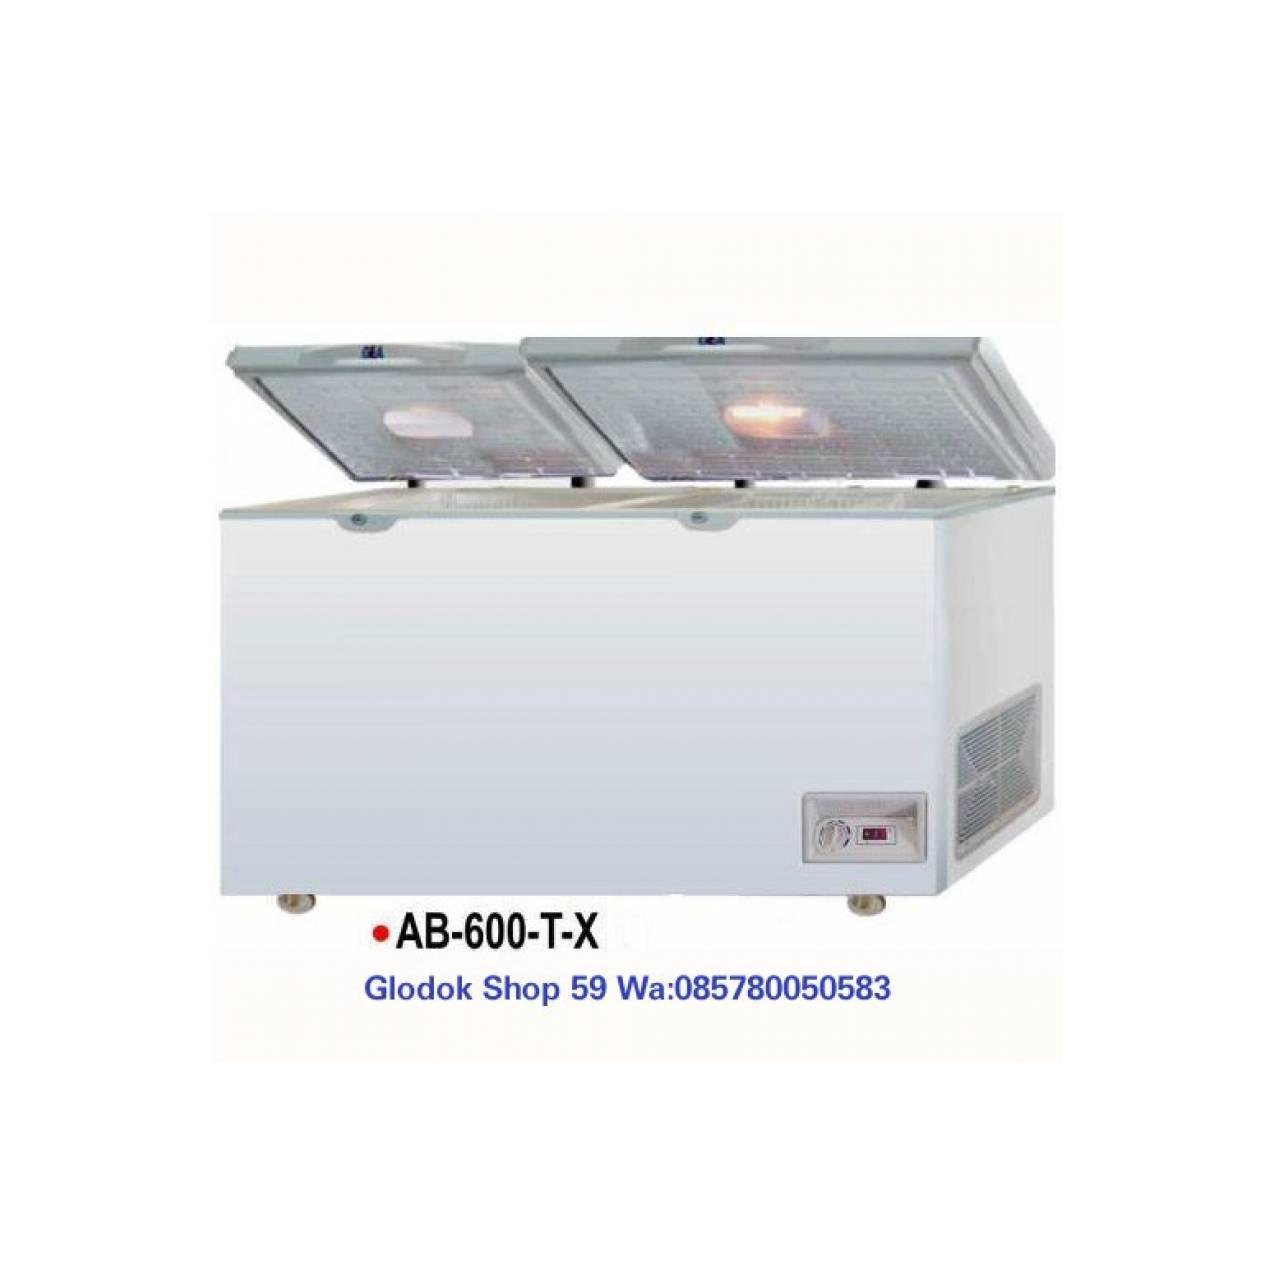 CHEST FREEZER GEA AB-600T-X KABINET PEMBEKU THERMOMETER DIGITAL NEW